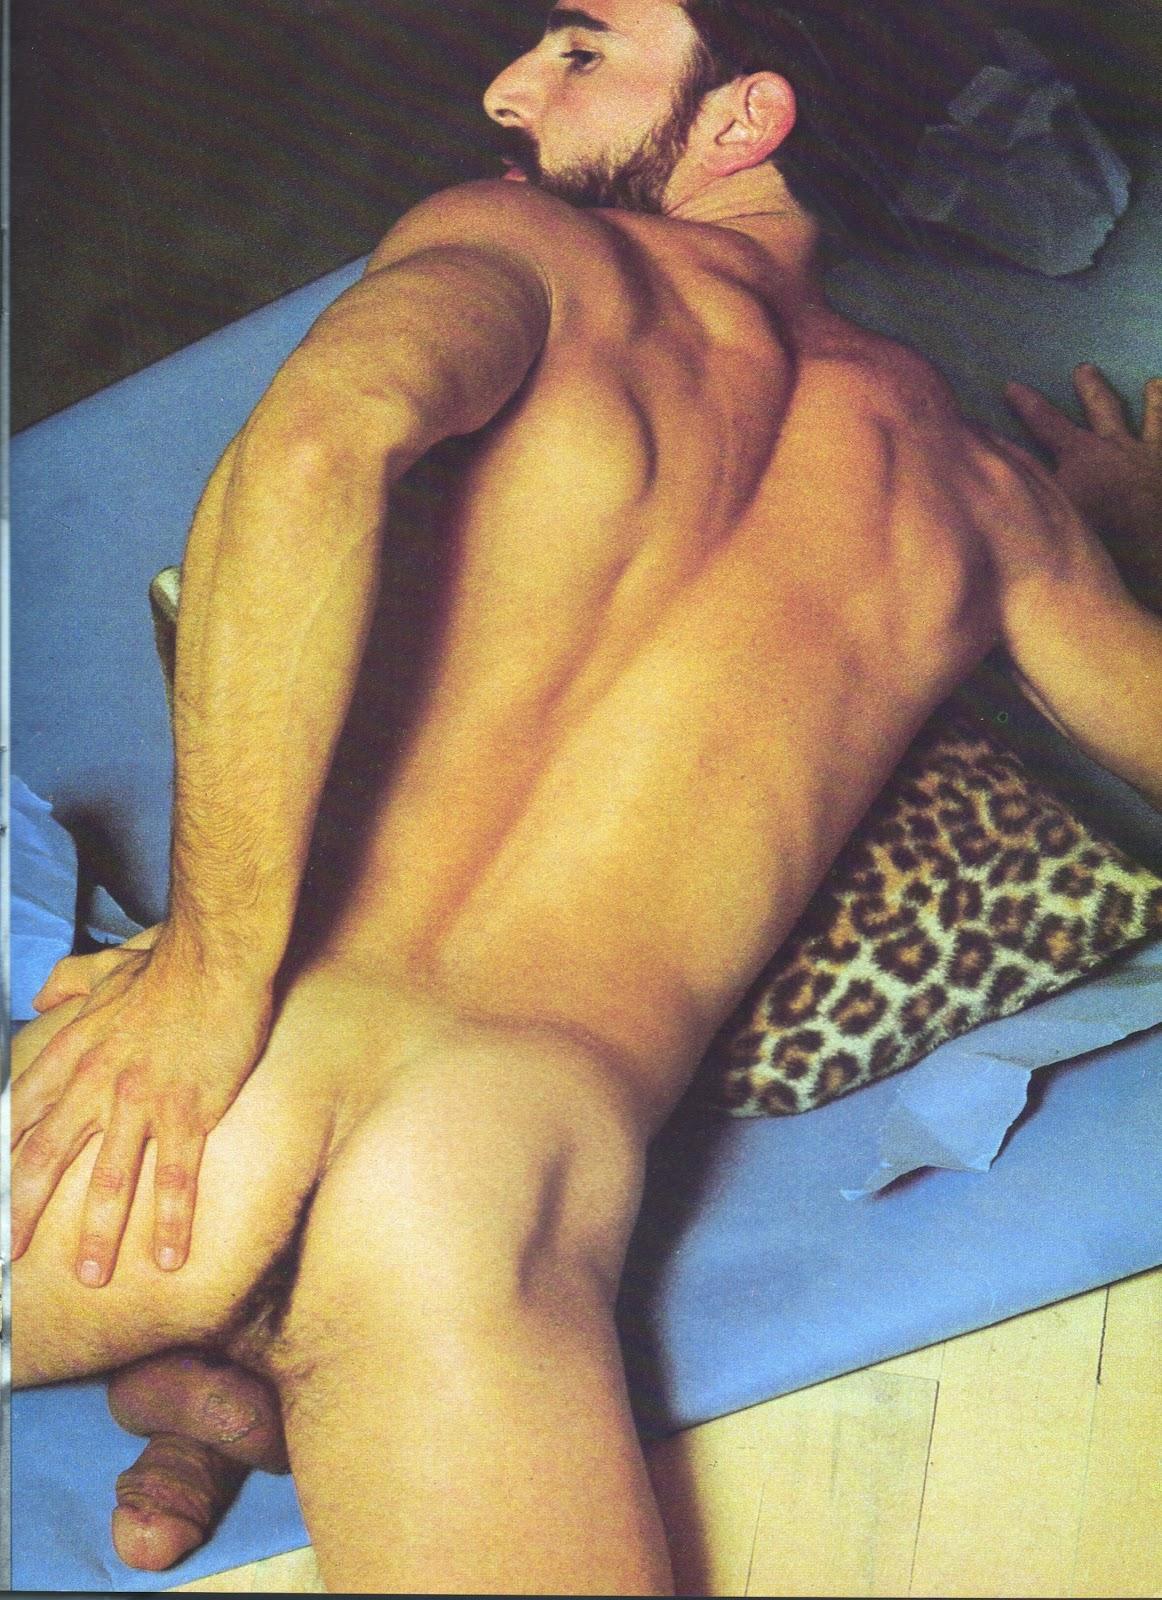 Al Parker Gay Porn al parker in torso #1 - gay porn obsession